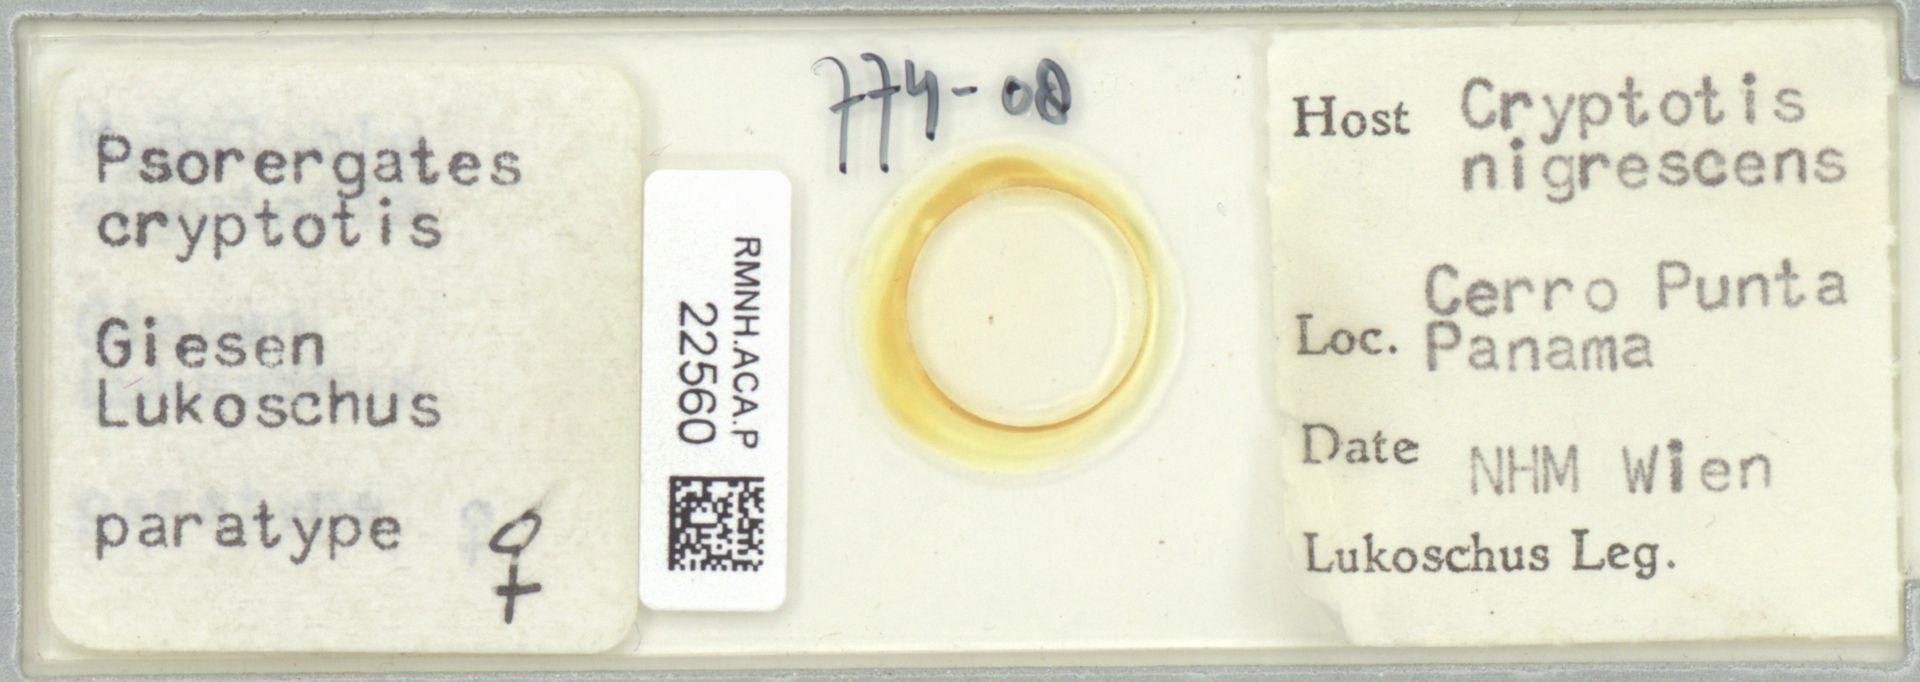 RMNH.ACA.P.22560 | Psorergates cryptotis Giesen Lukoschus